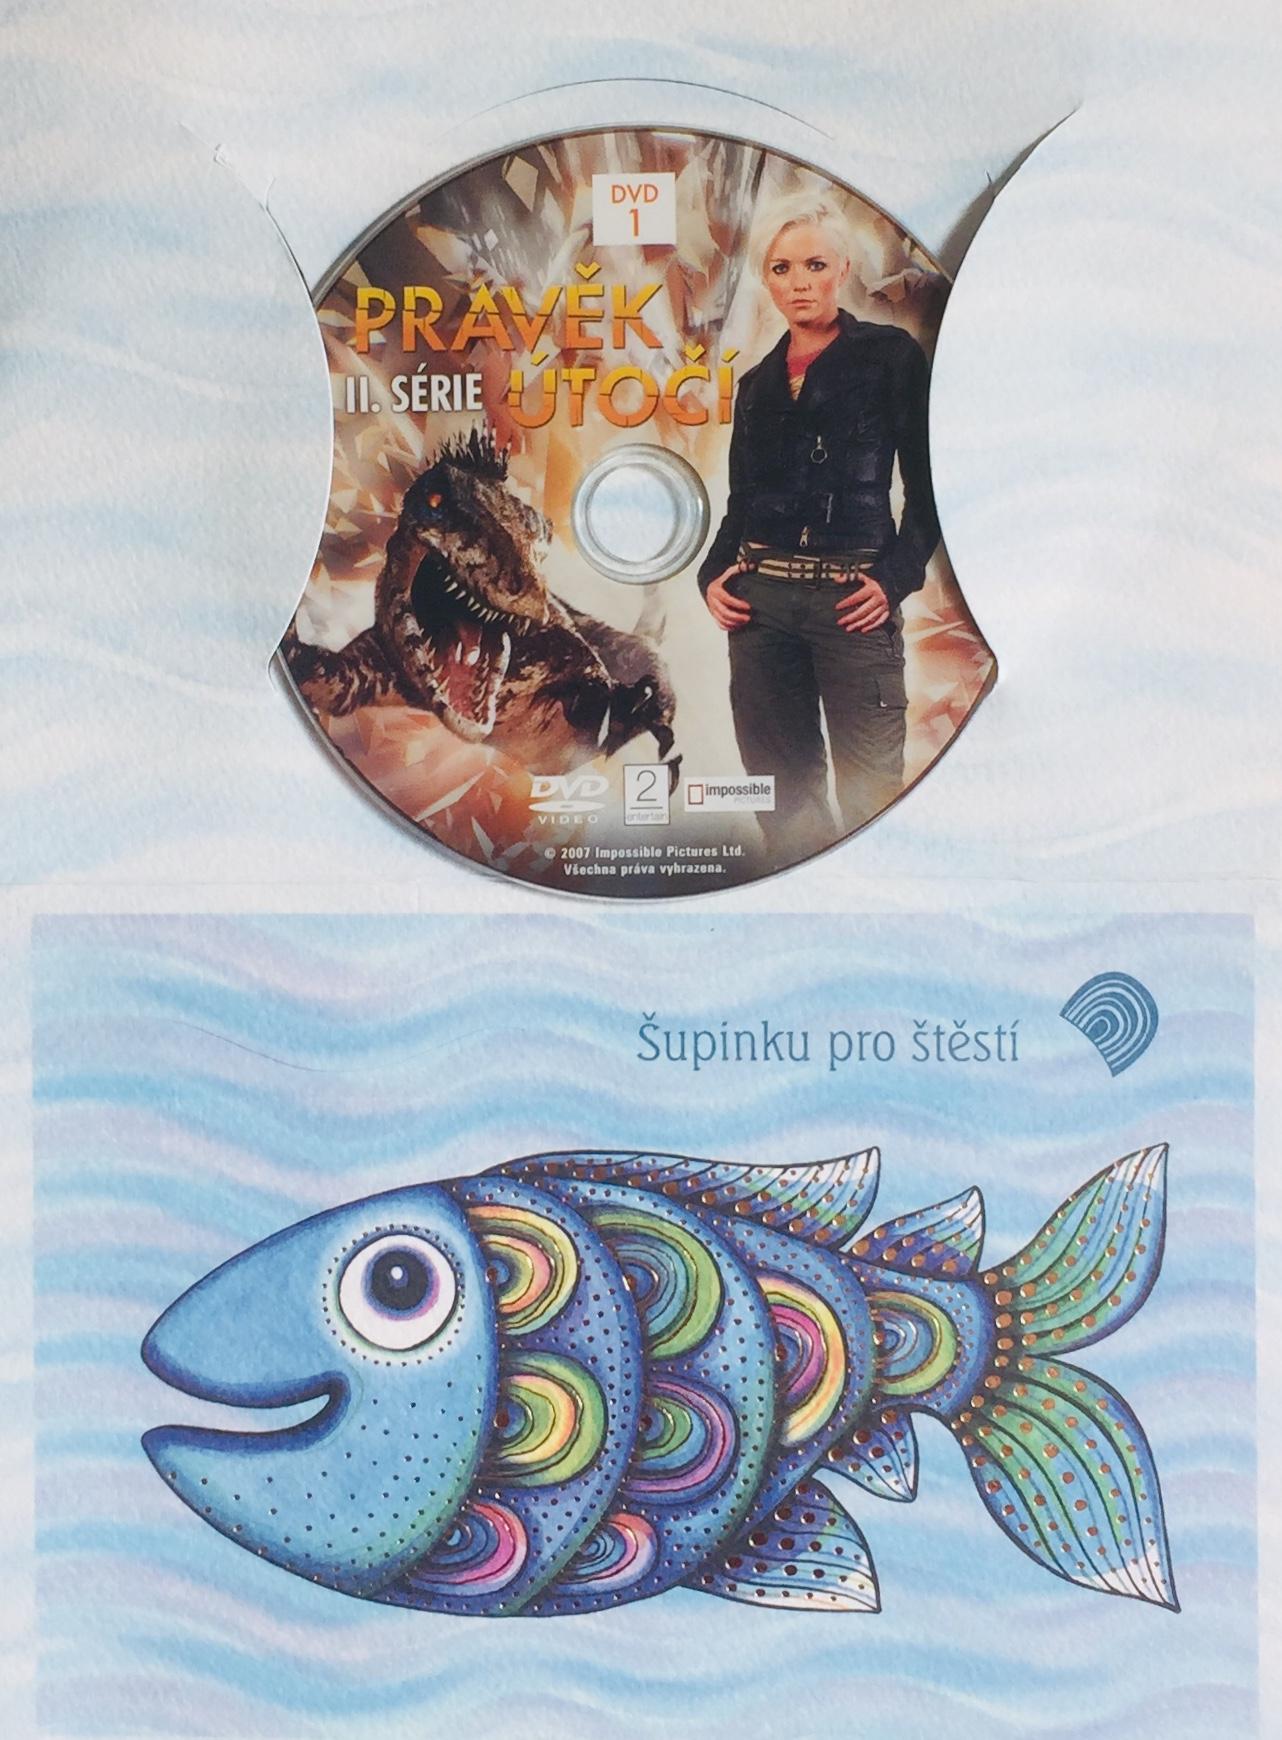 Pravěk útočí - II. série 1 - DVD /dárkový obal/